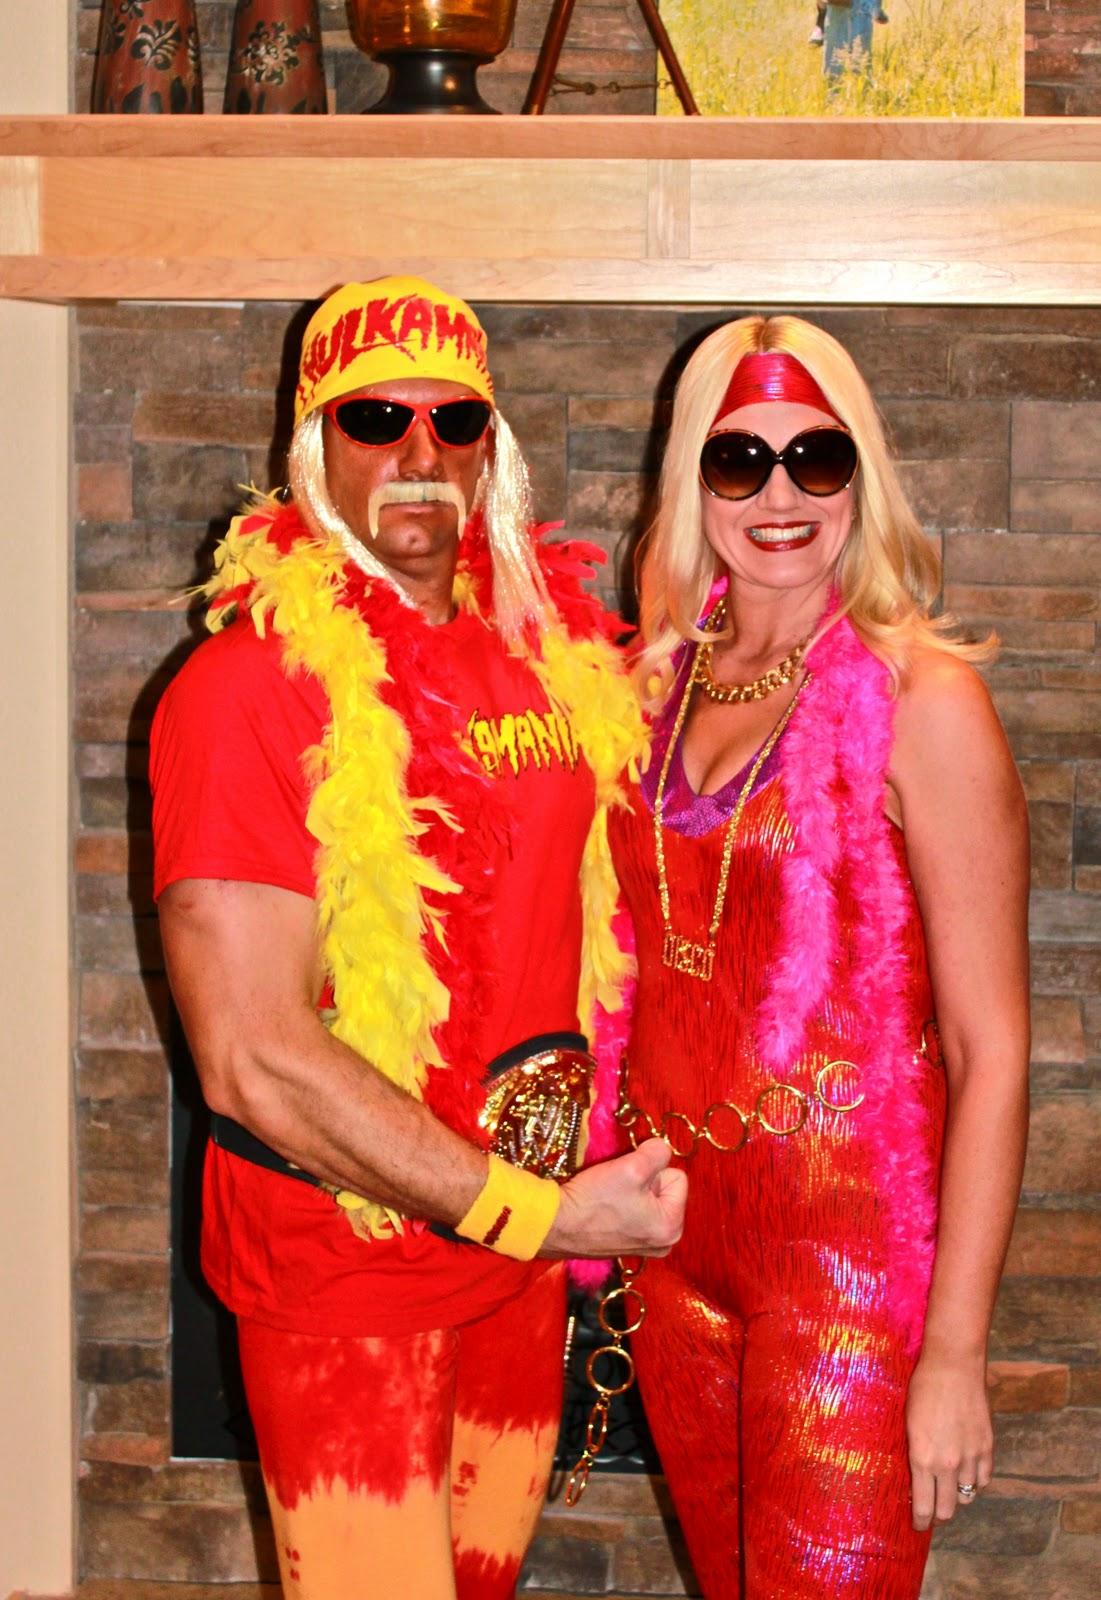 Hulkamania Hulk Hogan Costume - The Pinke Post